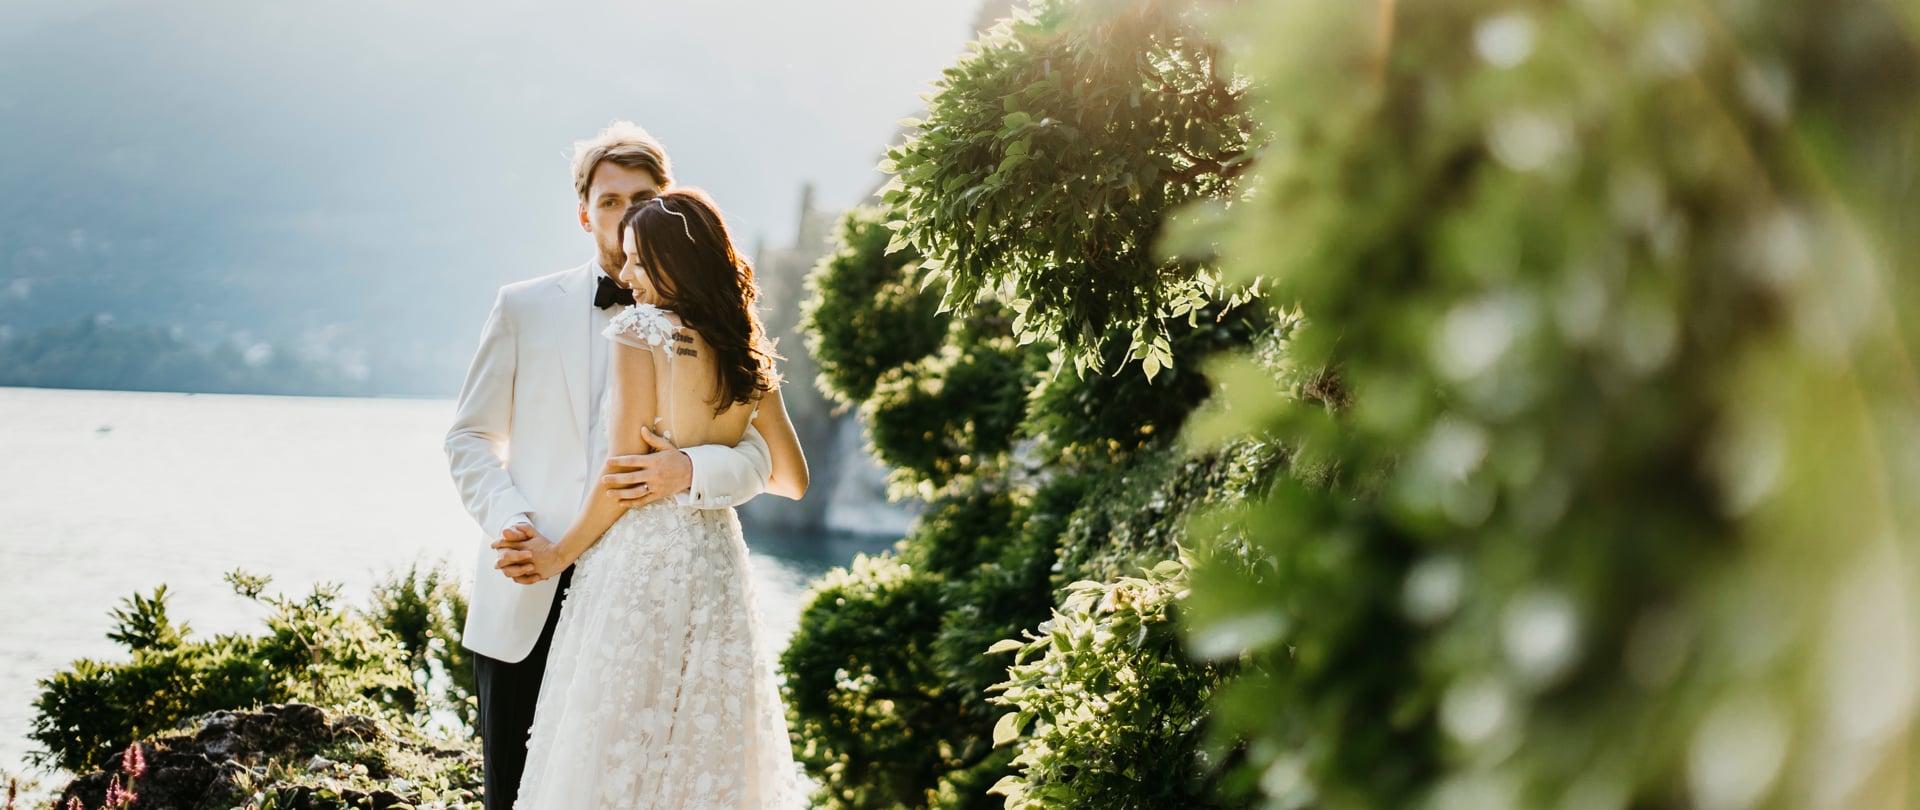 Maryna & Tom Wedding Video Filmed at Lake Como, Italy